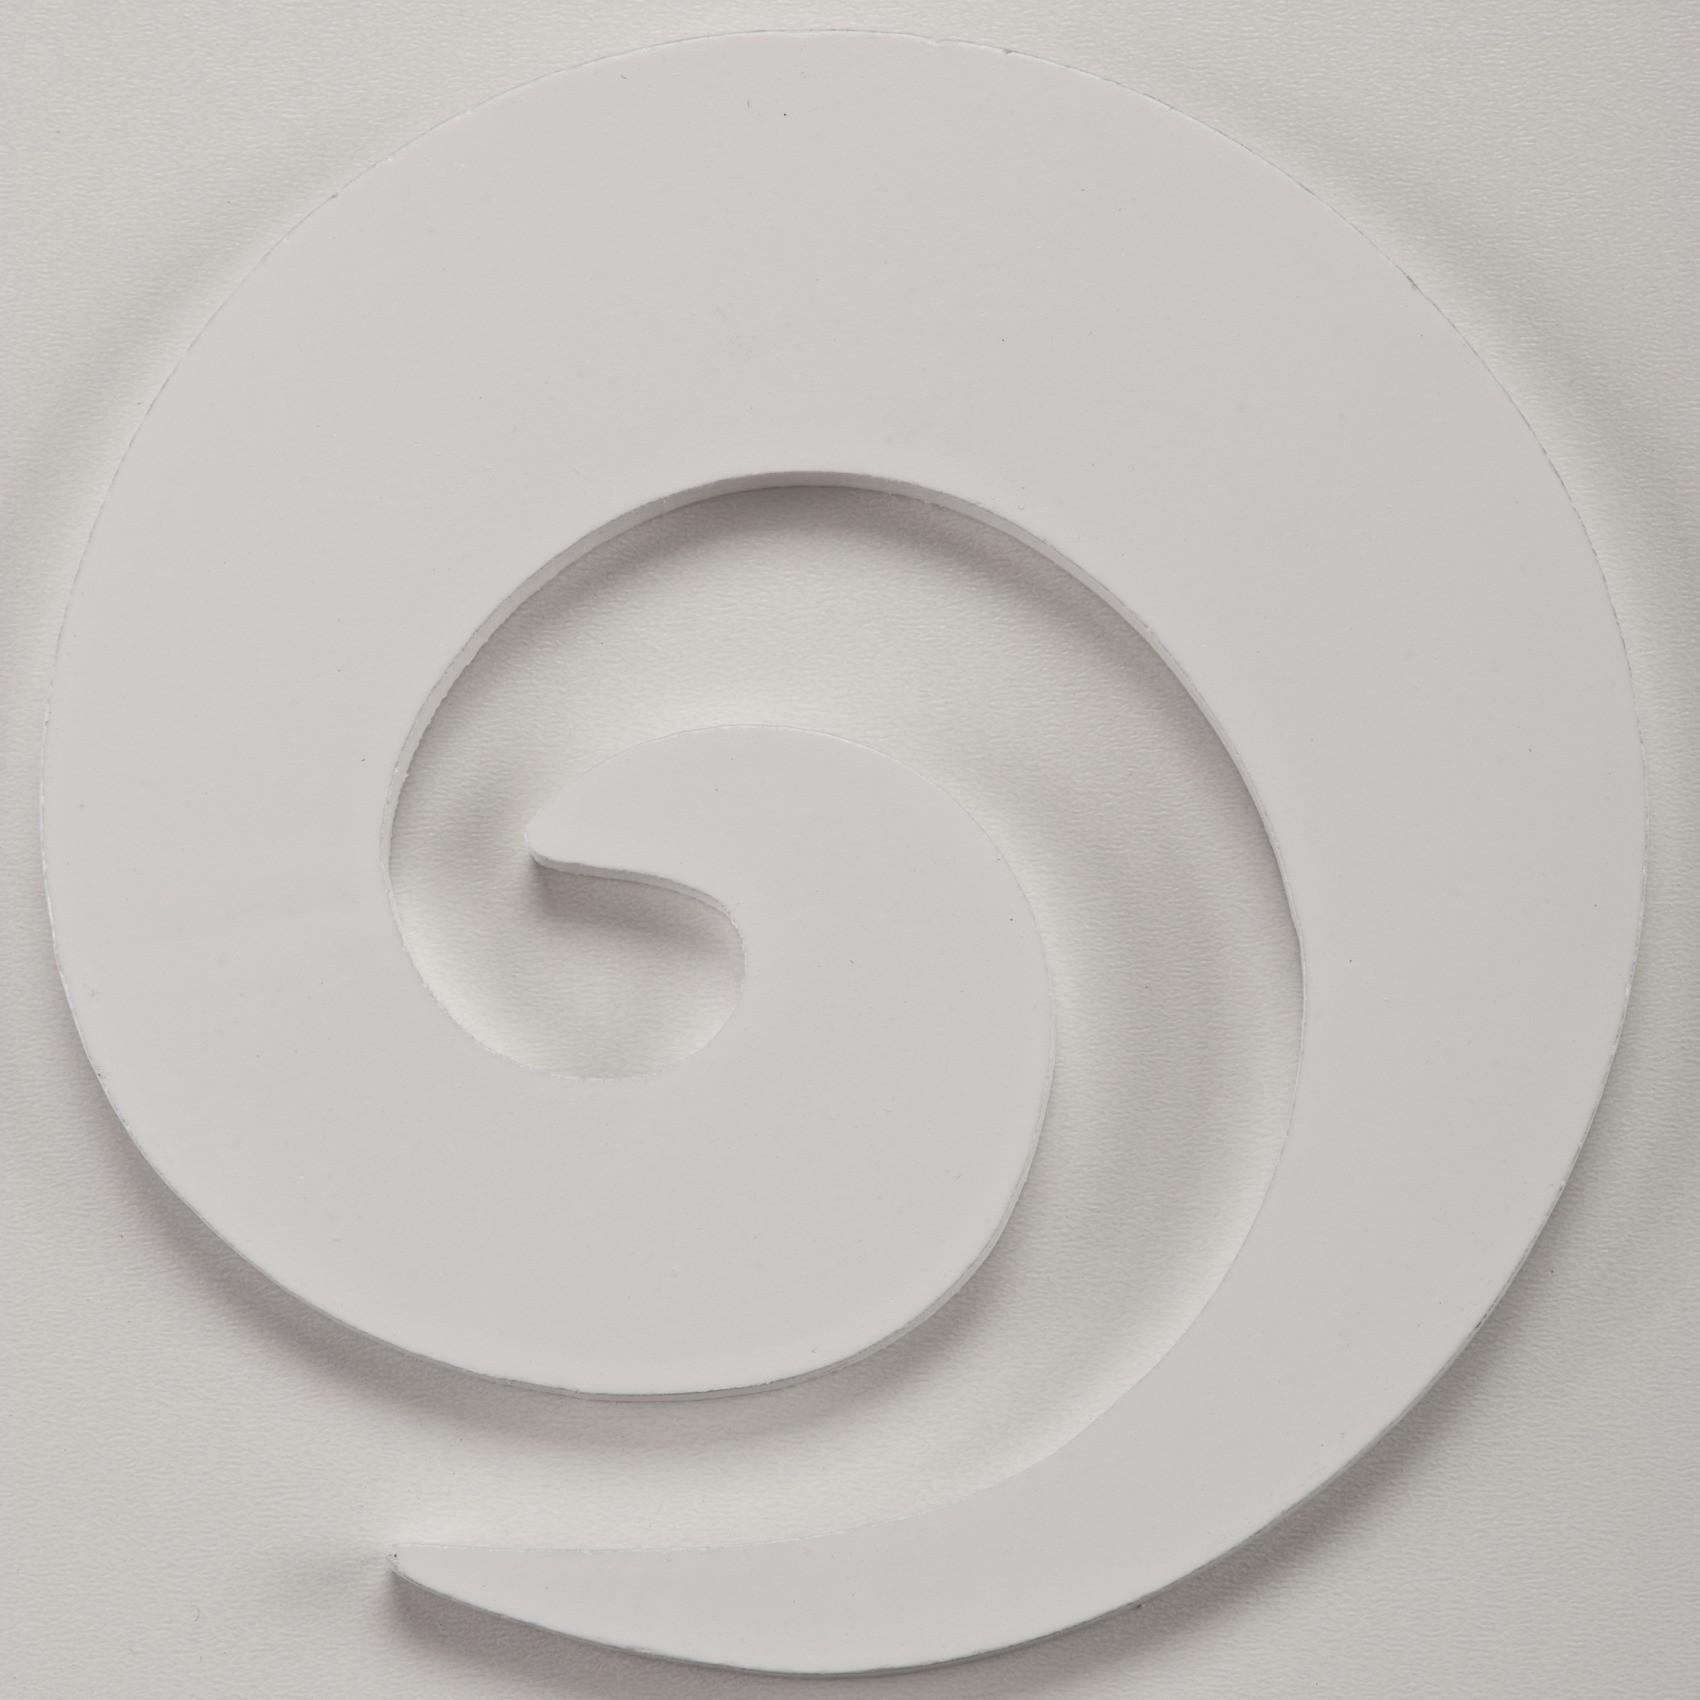 SLIMAK DEKOR 4271 - Biały